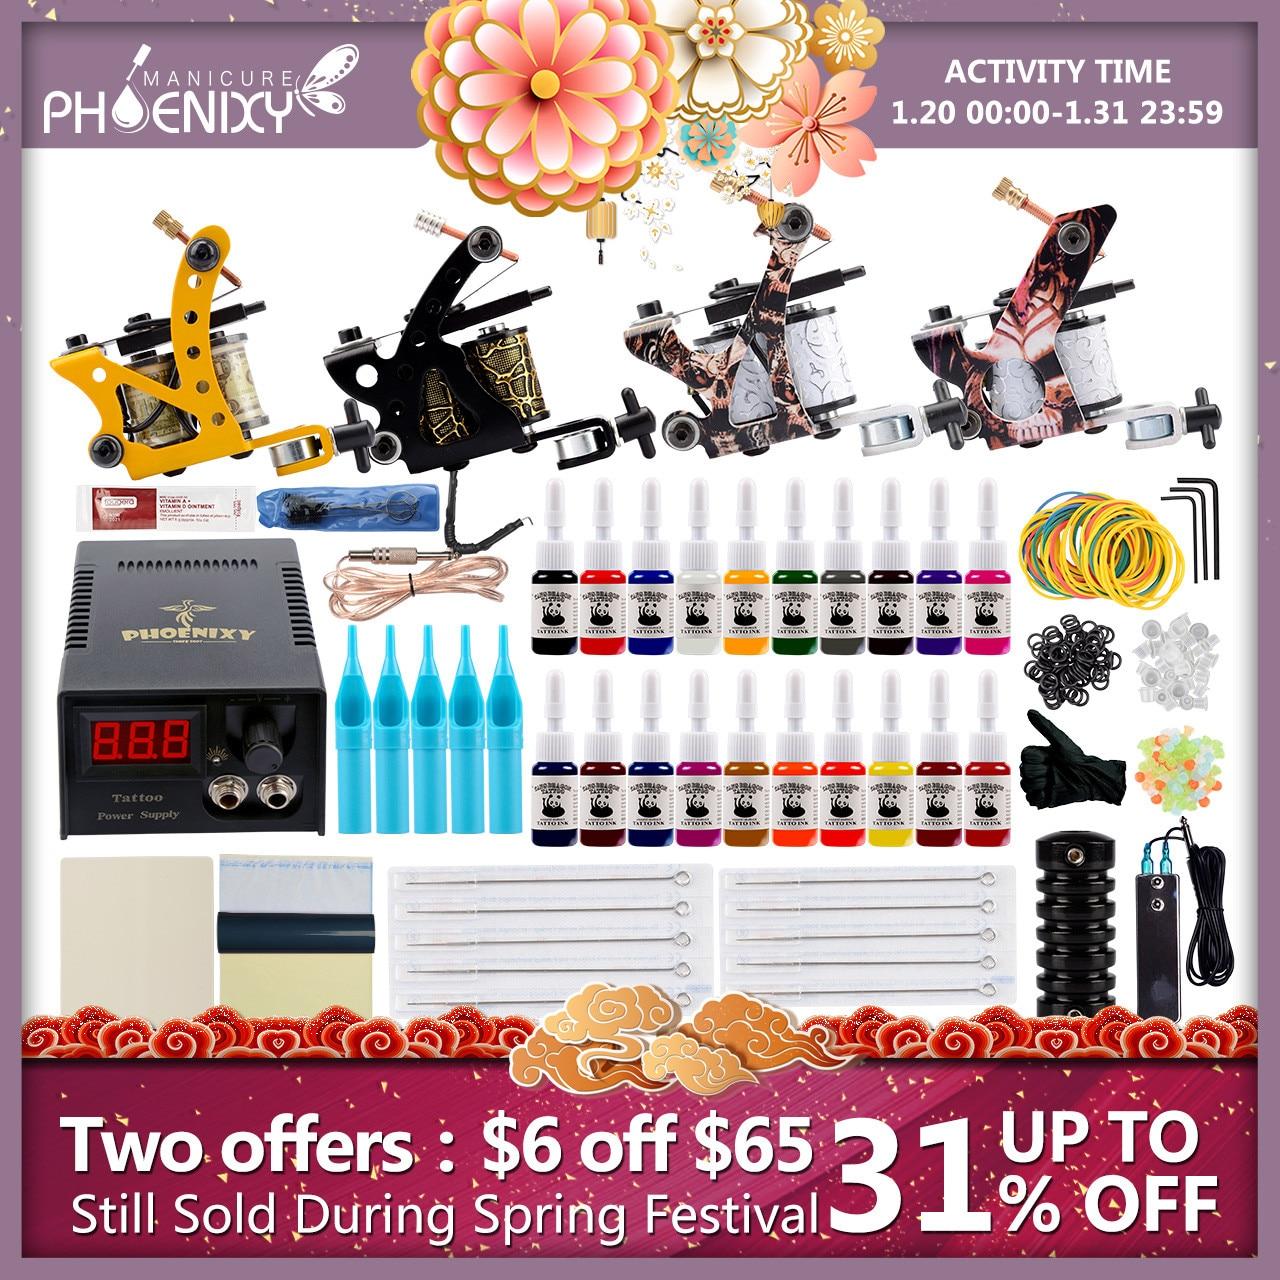 Professional Tattoo Kit 4 Machines Guns Set Tattoo Inks Pigment Power Supply Accessories Body Art Makeup Complete Tattoo Set